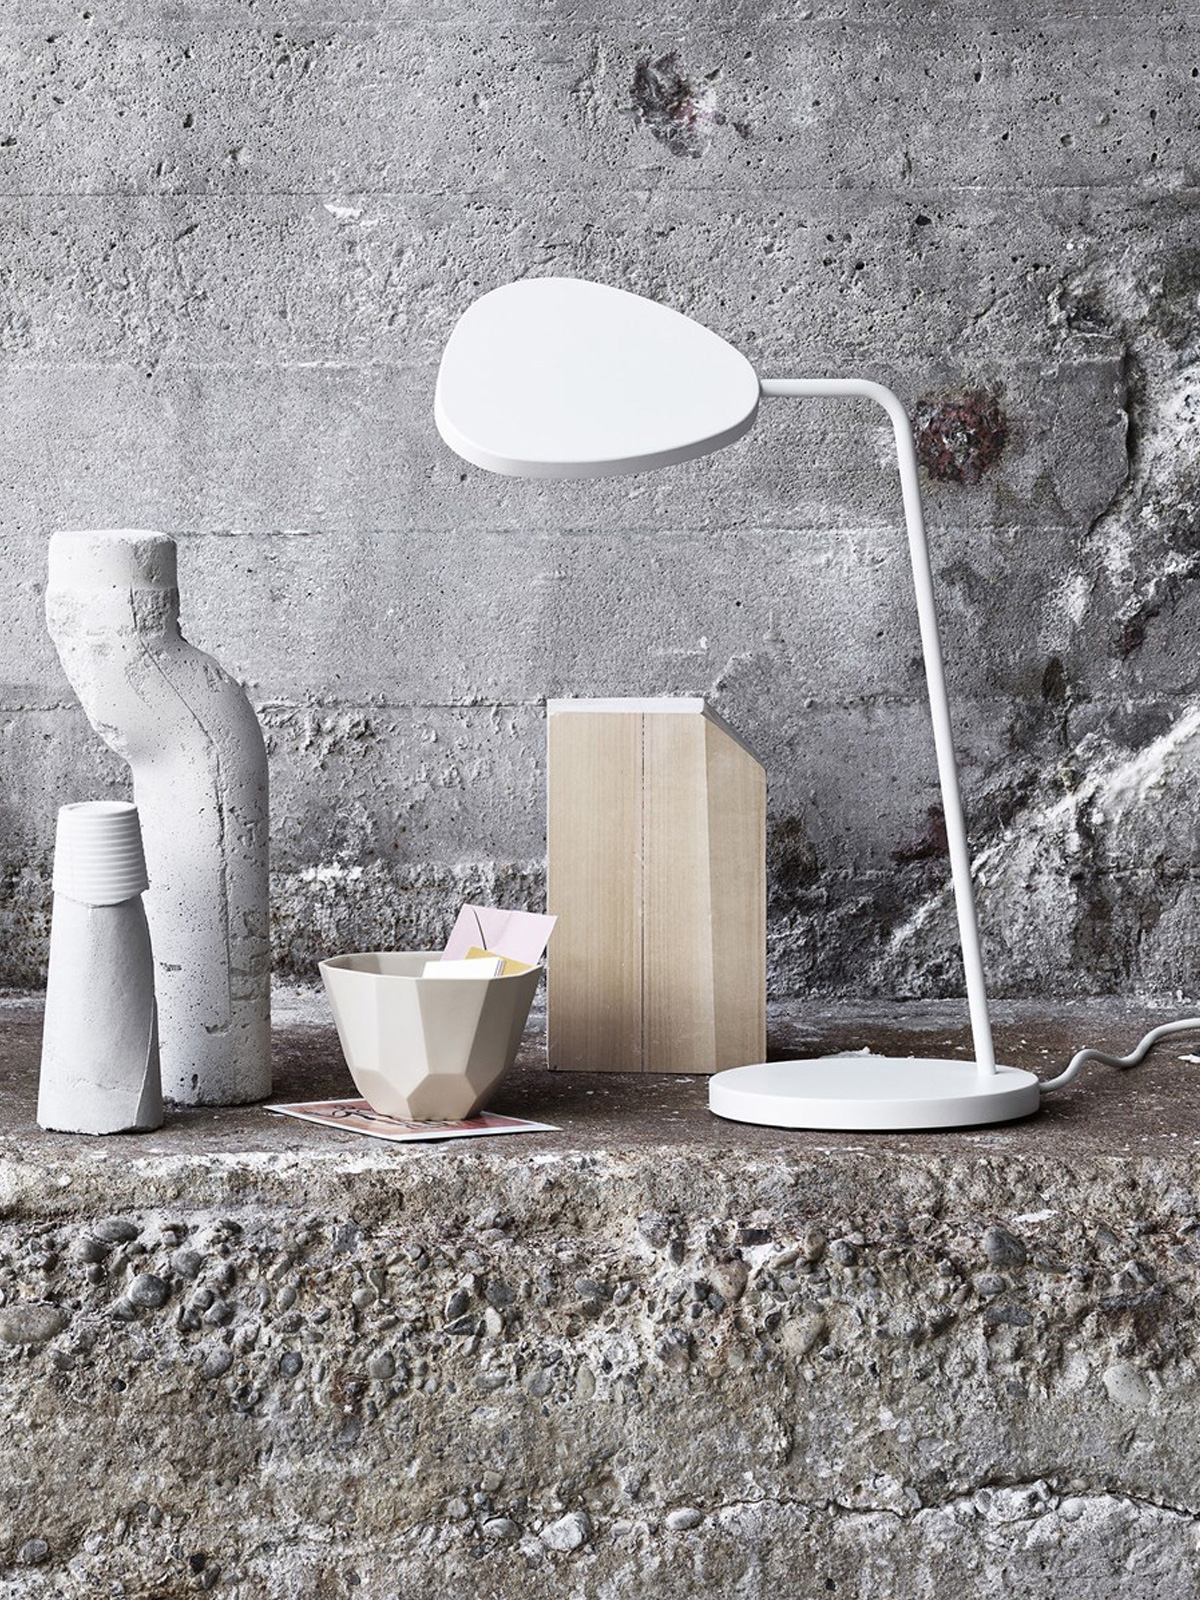 Leaf Table LED Tischlampe muuto DesignOrt Onlineshop Lampen Berlin